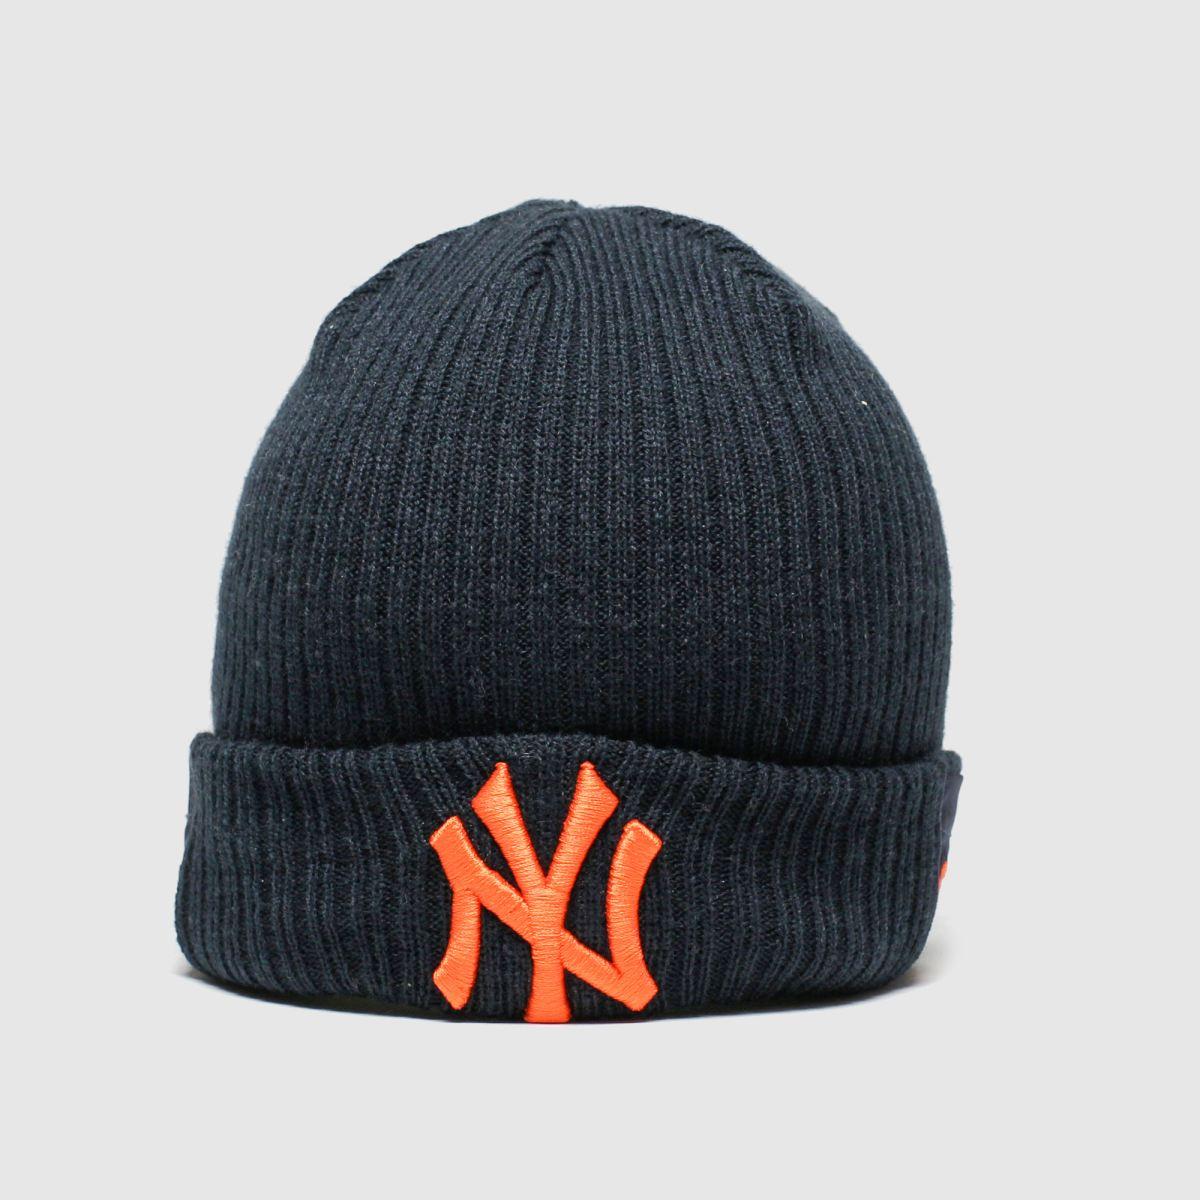 New Era Accessories New Era Navy & Orange Kids Ny Utility Cuff Knit